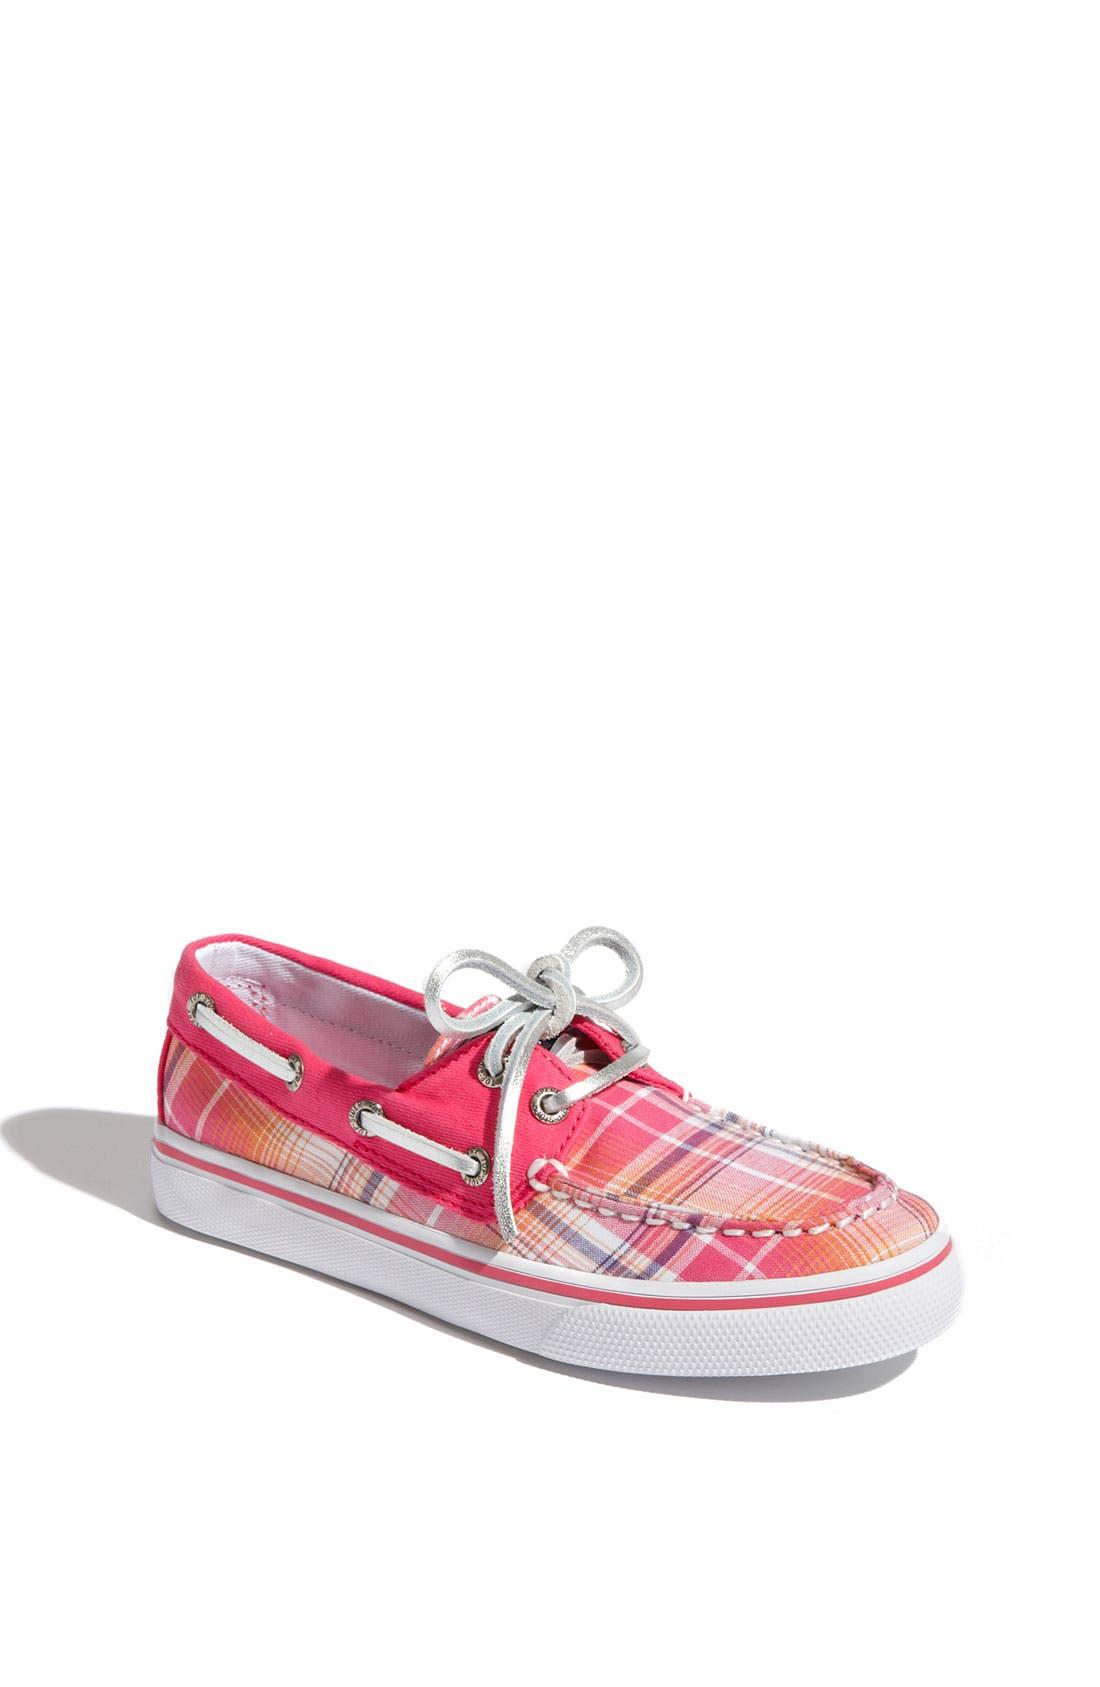 Main Image - Sperry Top-Sider® 'Bahama' Boat Shoe (Little Kid & Big Kid)